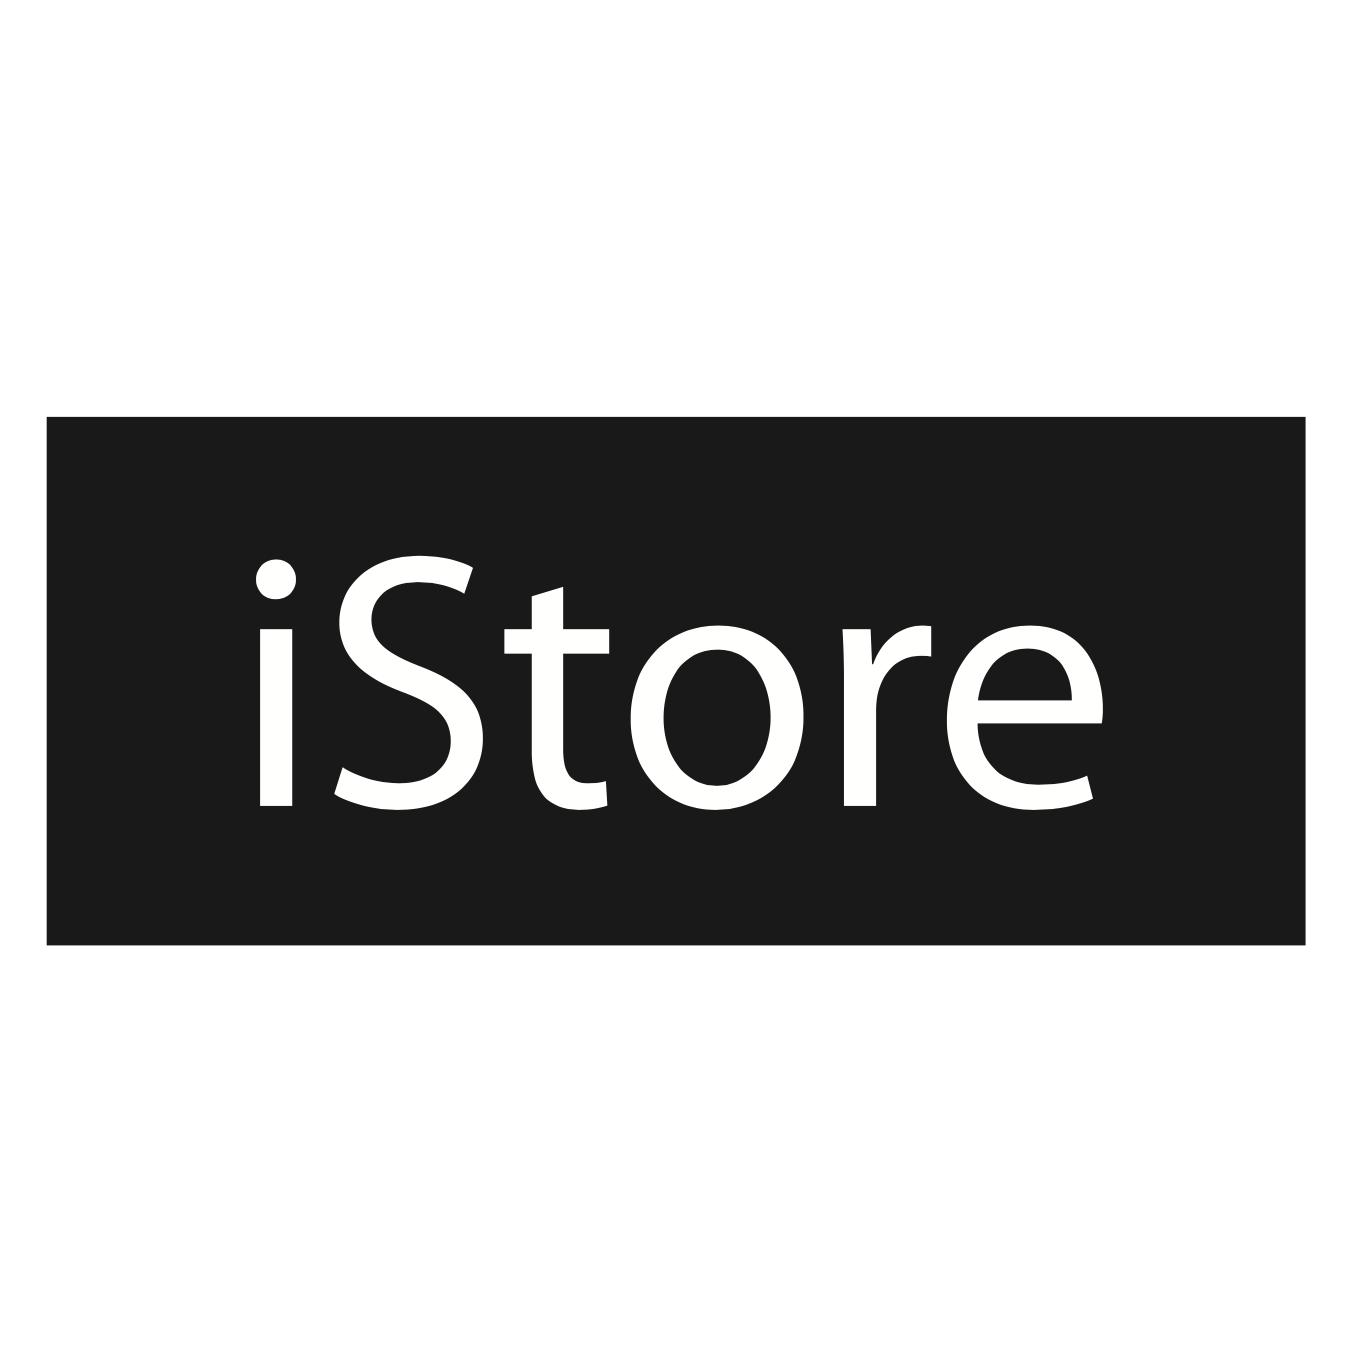 Case Mate Brilliance Case with Micropel for iPhone 12 mini - Herringbone Black